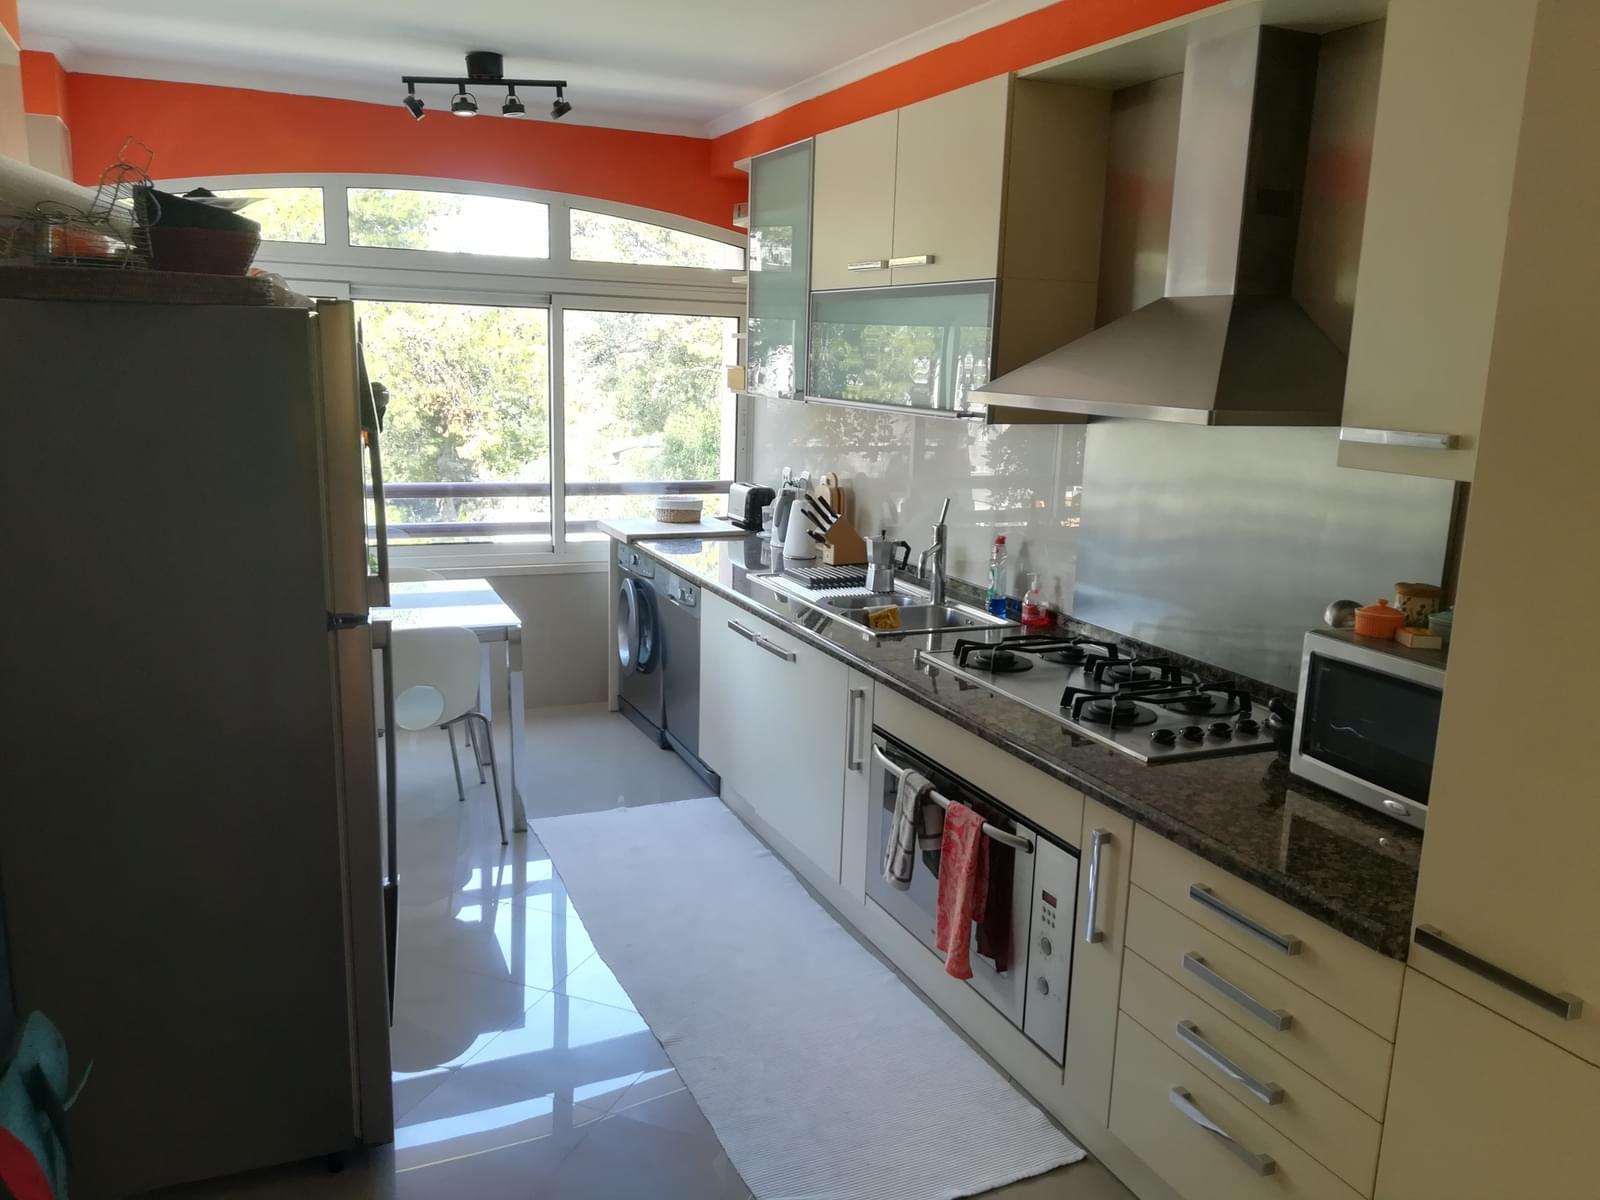 pf17981-apartamento-t3-f02c0974-9d57-4d70-a1d2-b024c00f8bad